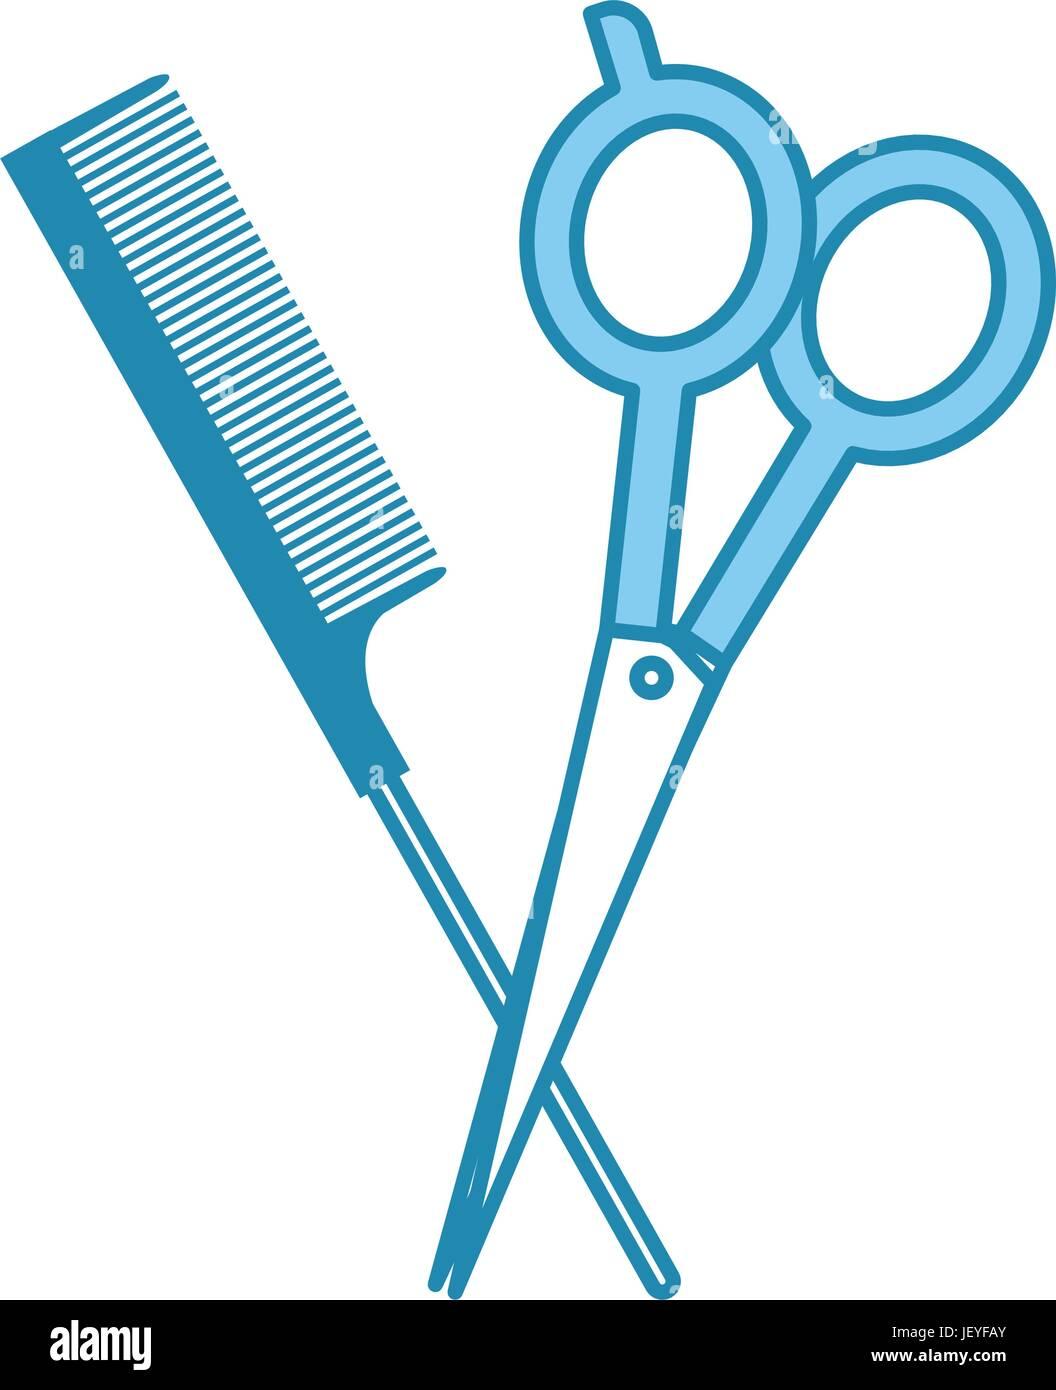 Scissors And Comb Clipart : scissors, clipart, Barbershop, Scissor, Isolated, Stock, Vector, Image, Alamy